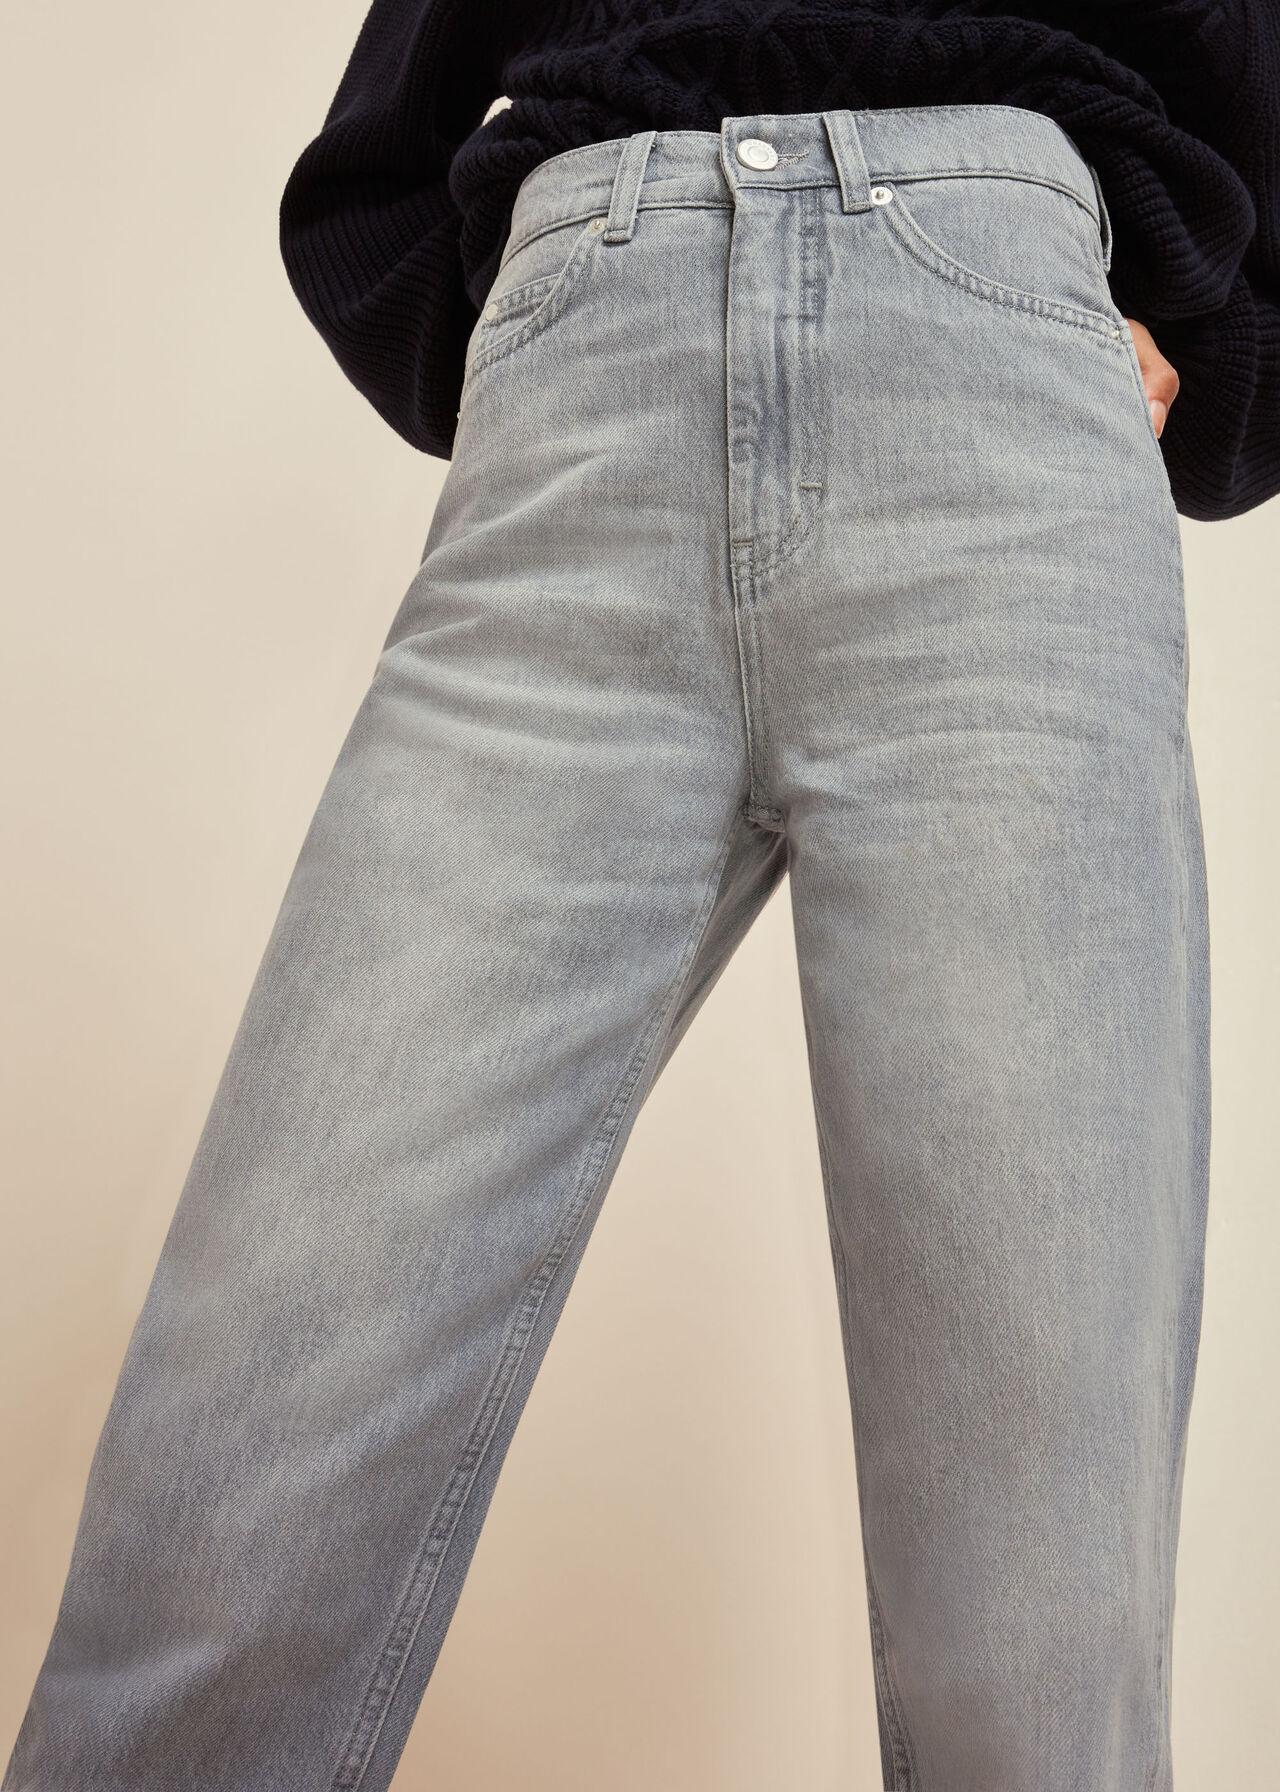 Authentic Barrel Leg Jean